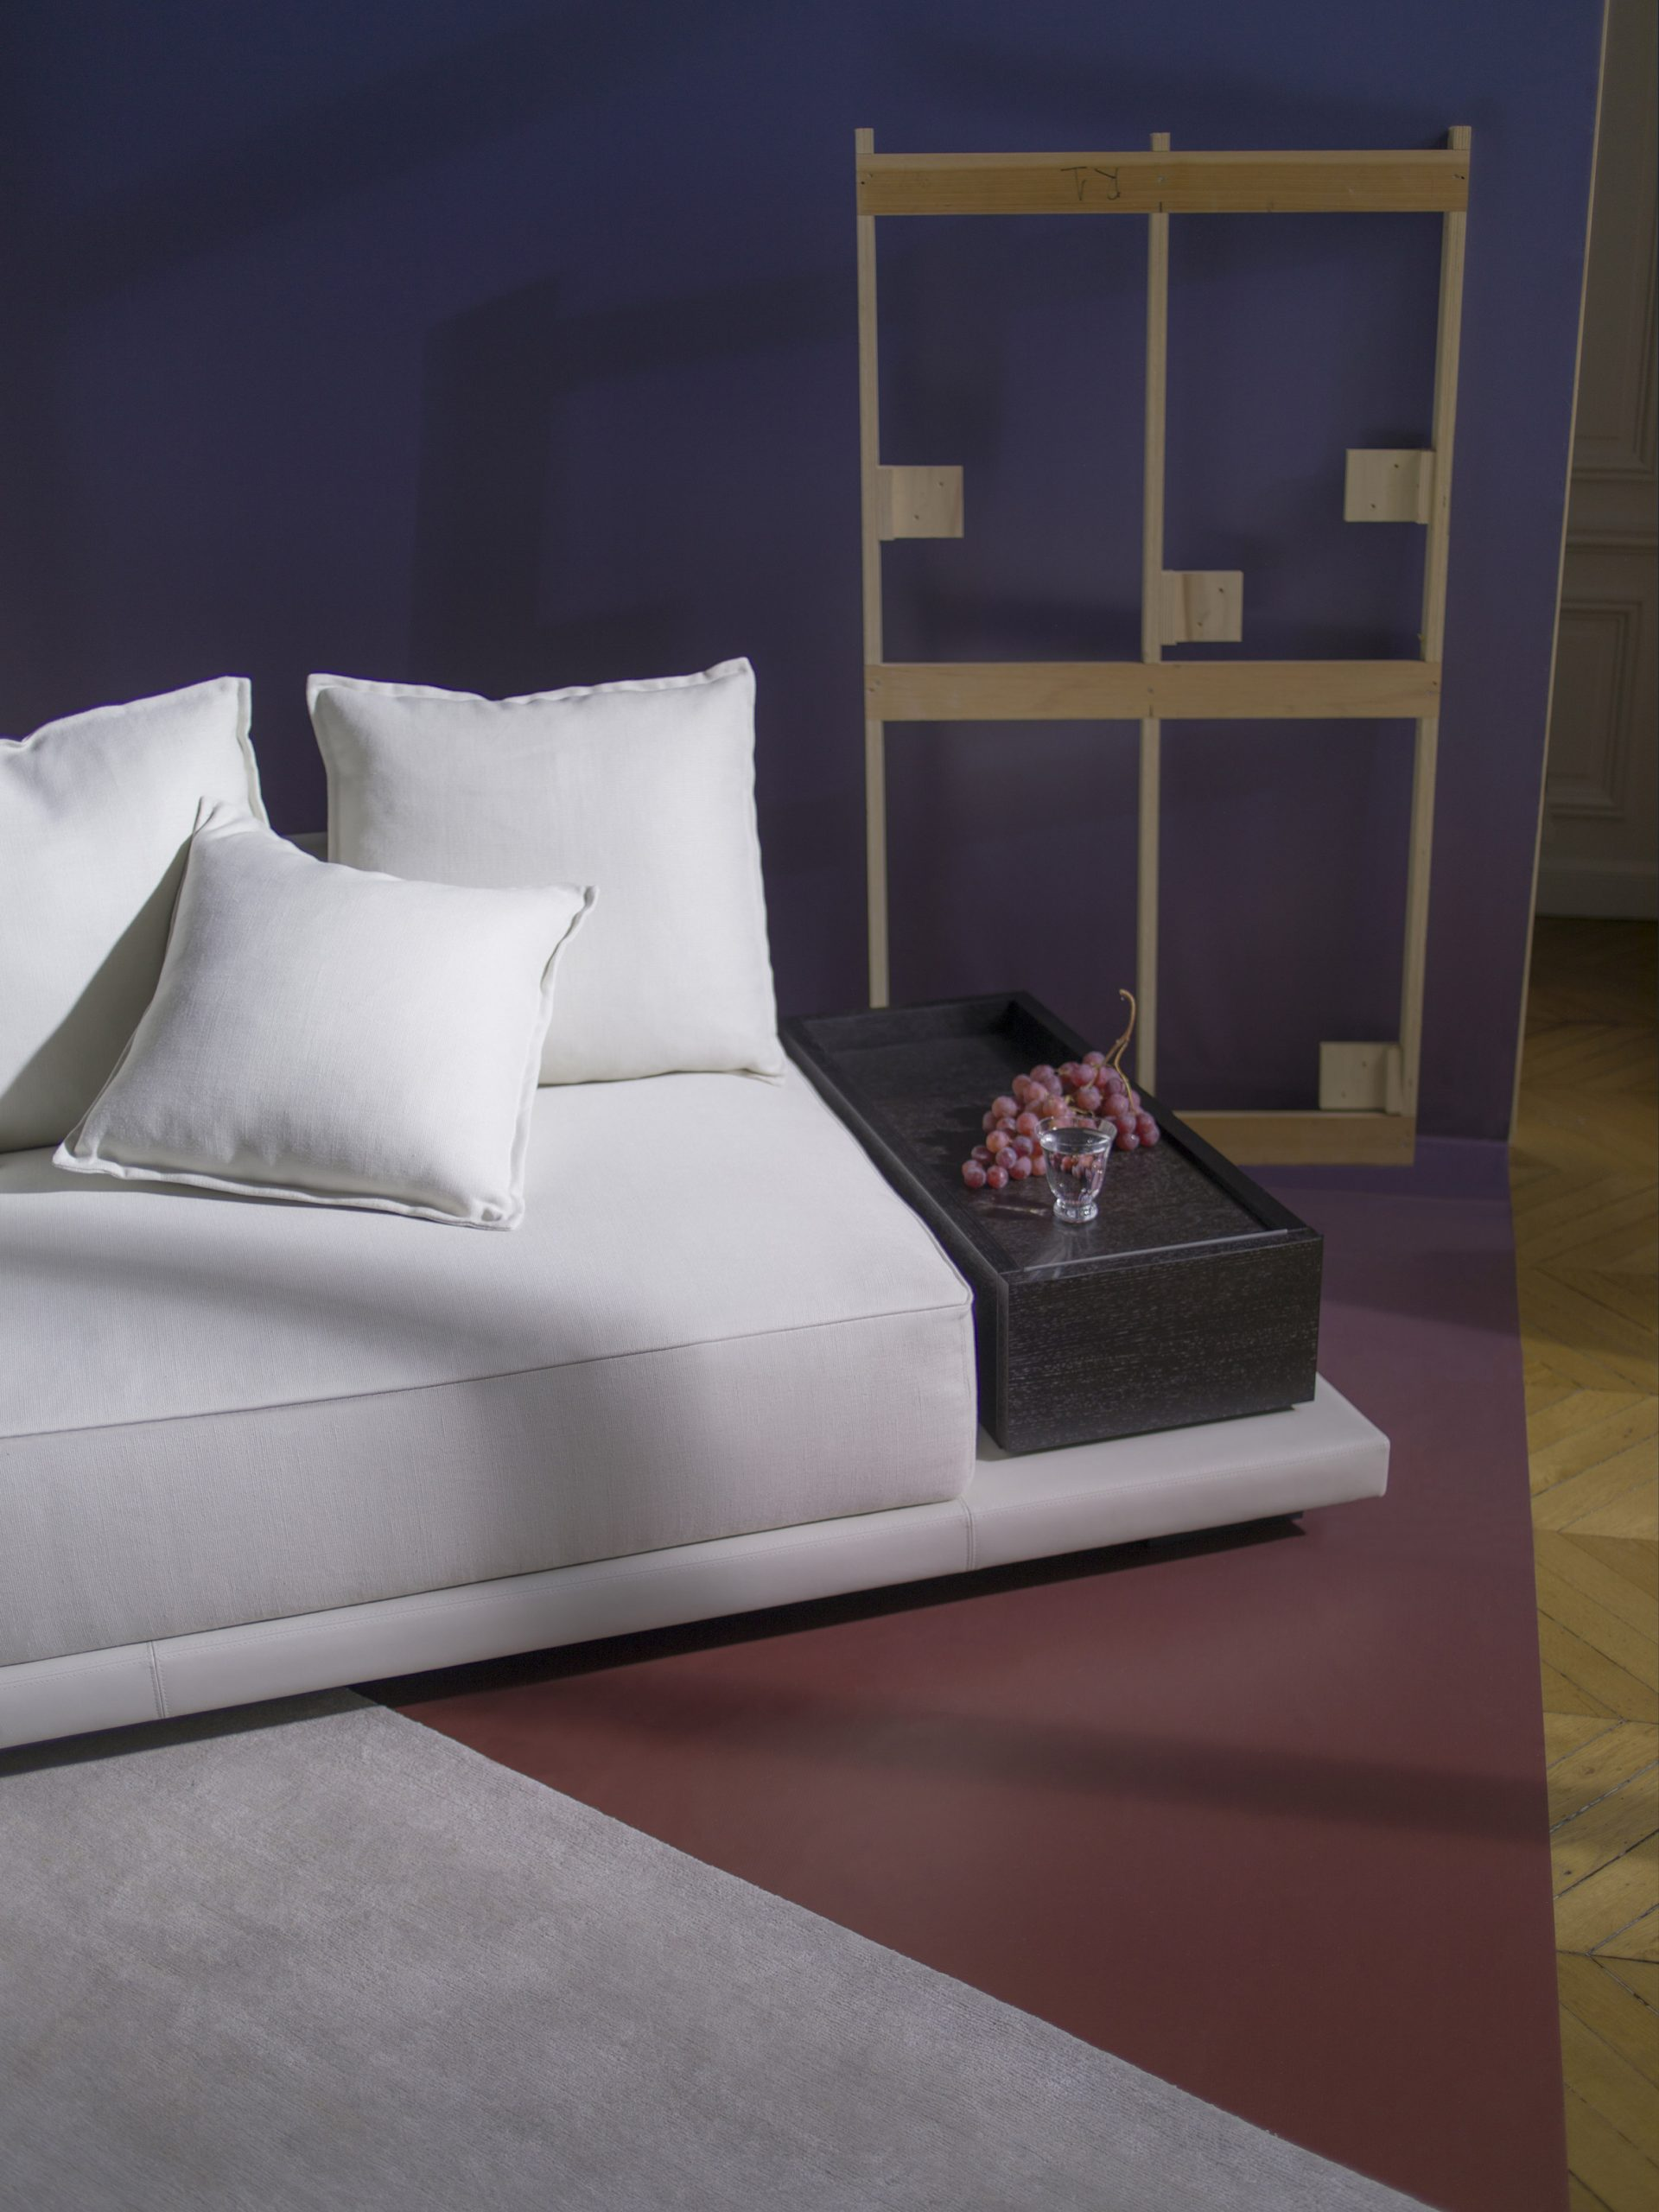 A modular sofa unit with inbuilt storage